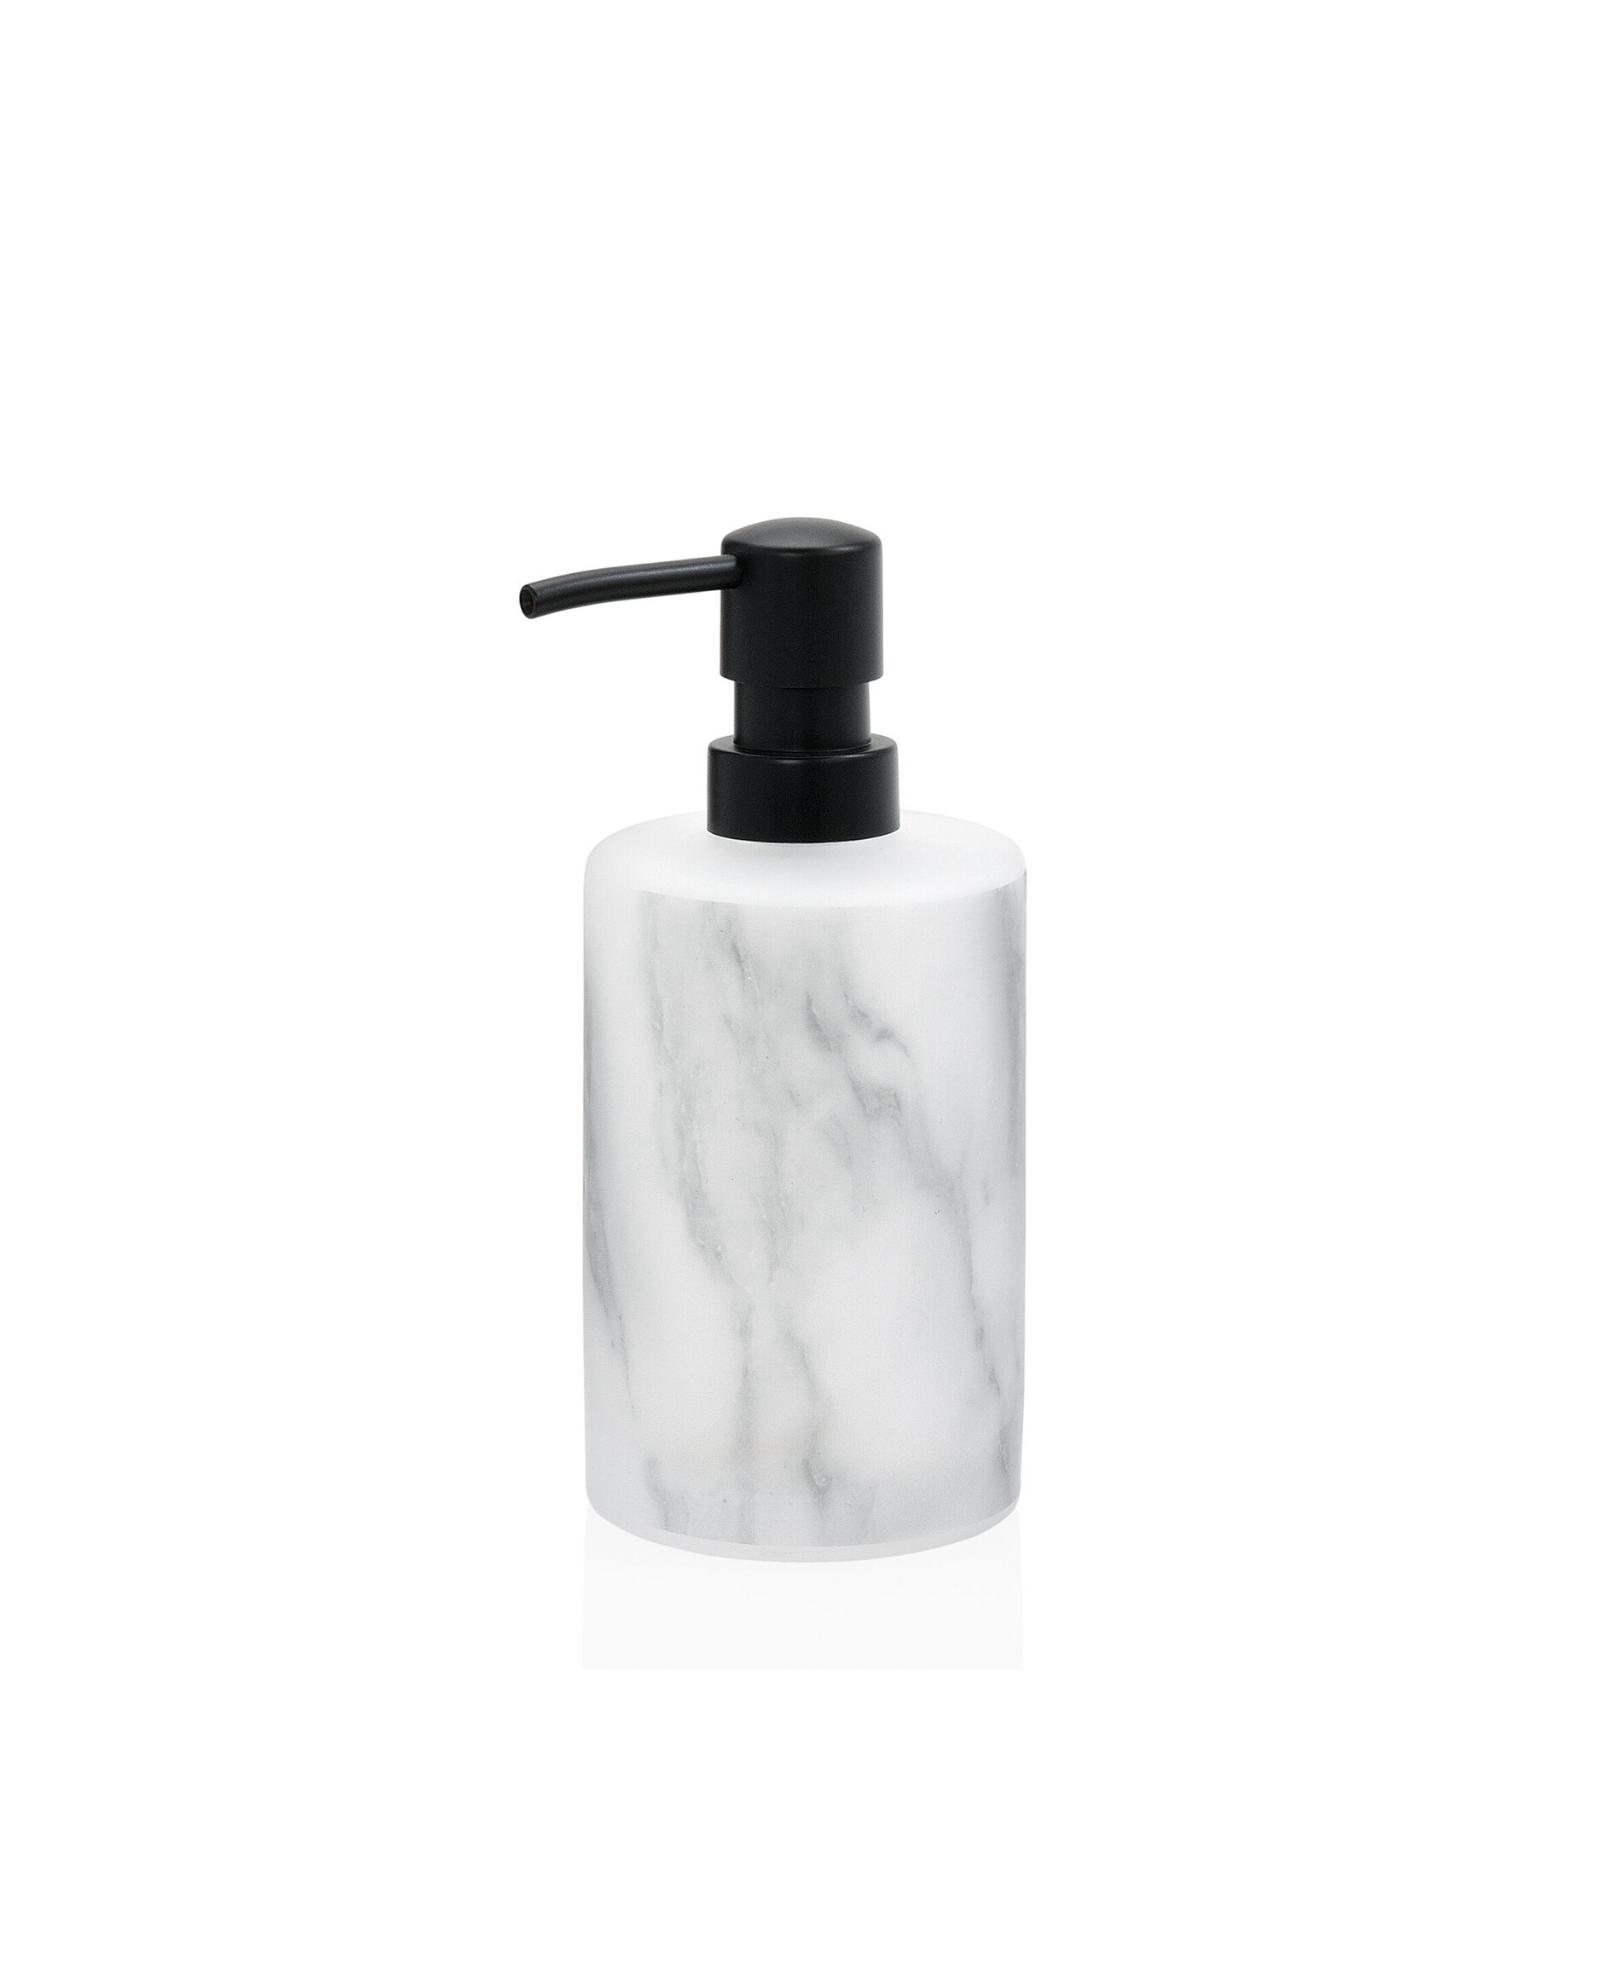 conjunto acessorios de banho efeito vidro